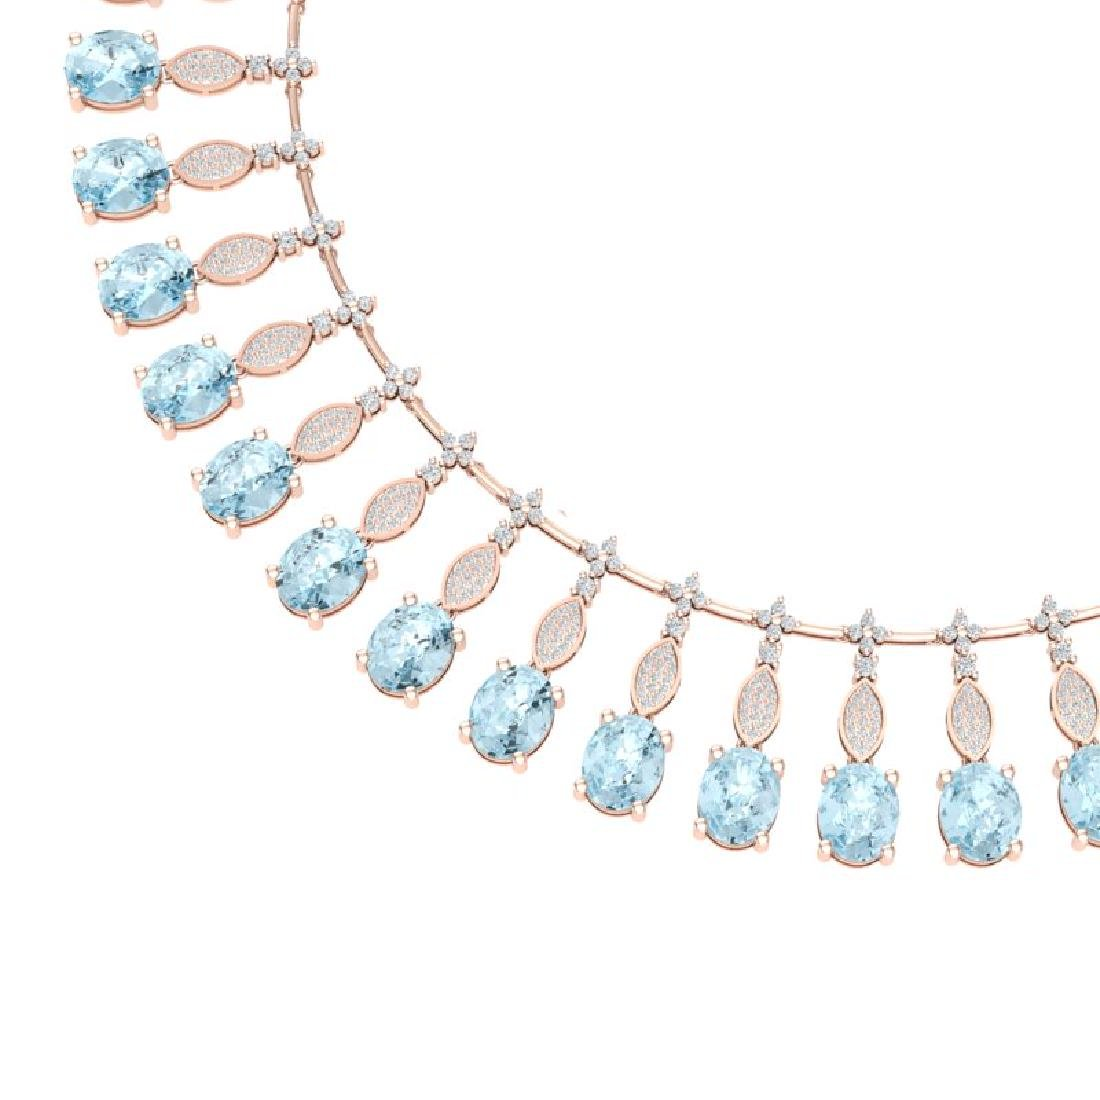 65.76 CTW Royalty Sky Topaz & VS Diamond Necklace 18K